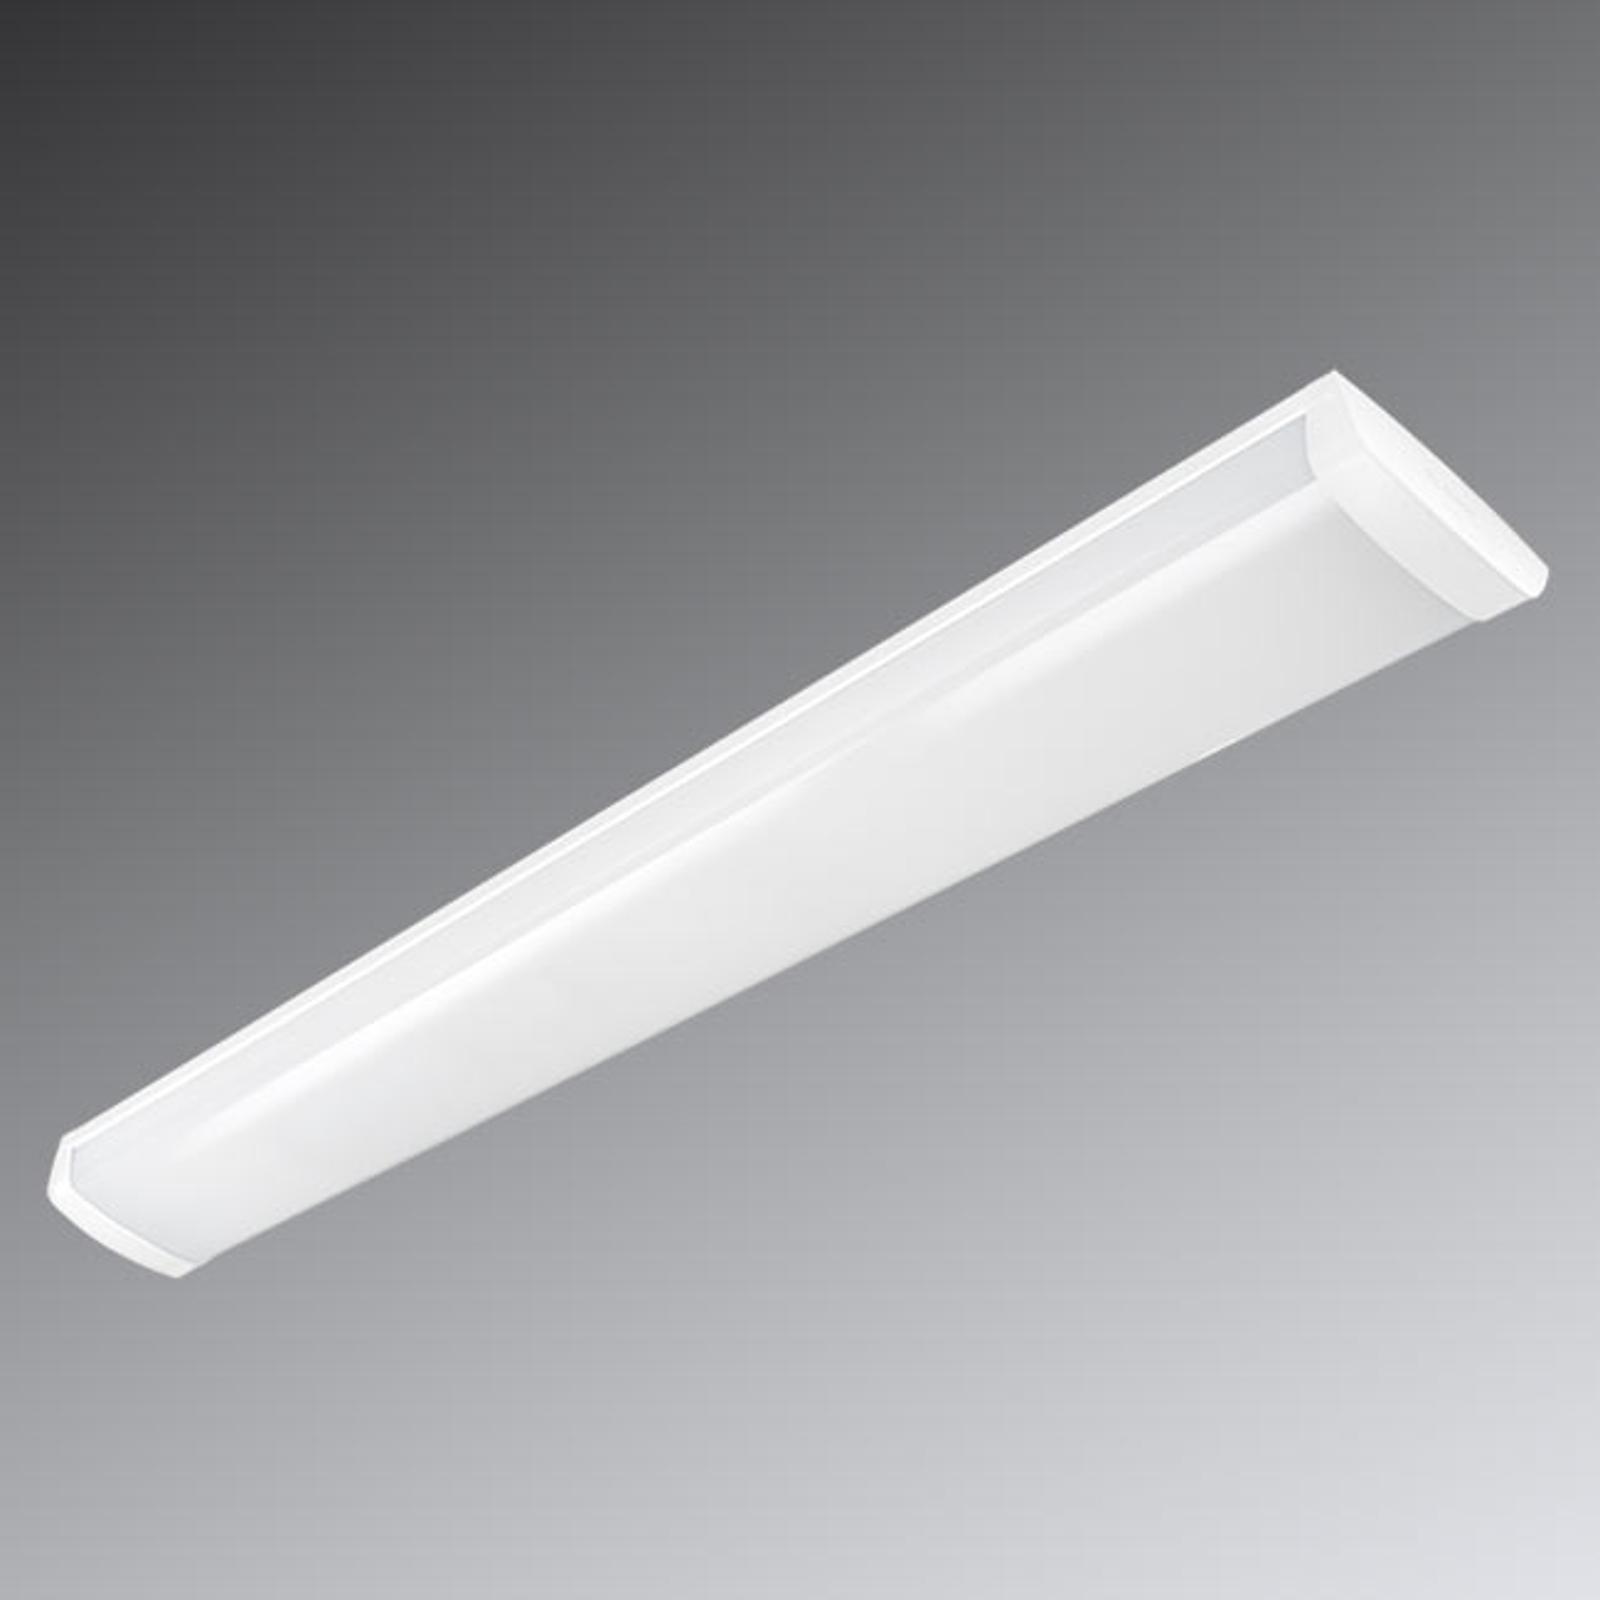 Pitkä LED-kattovalaisin i60-1500 6000 HF 3 000 K